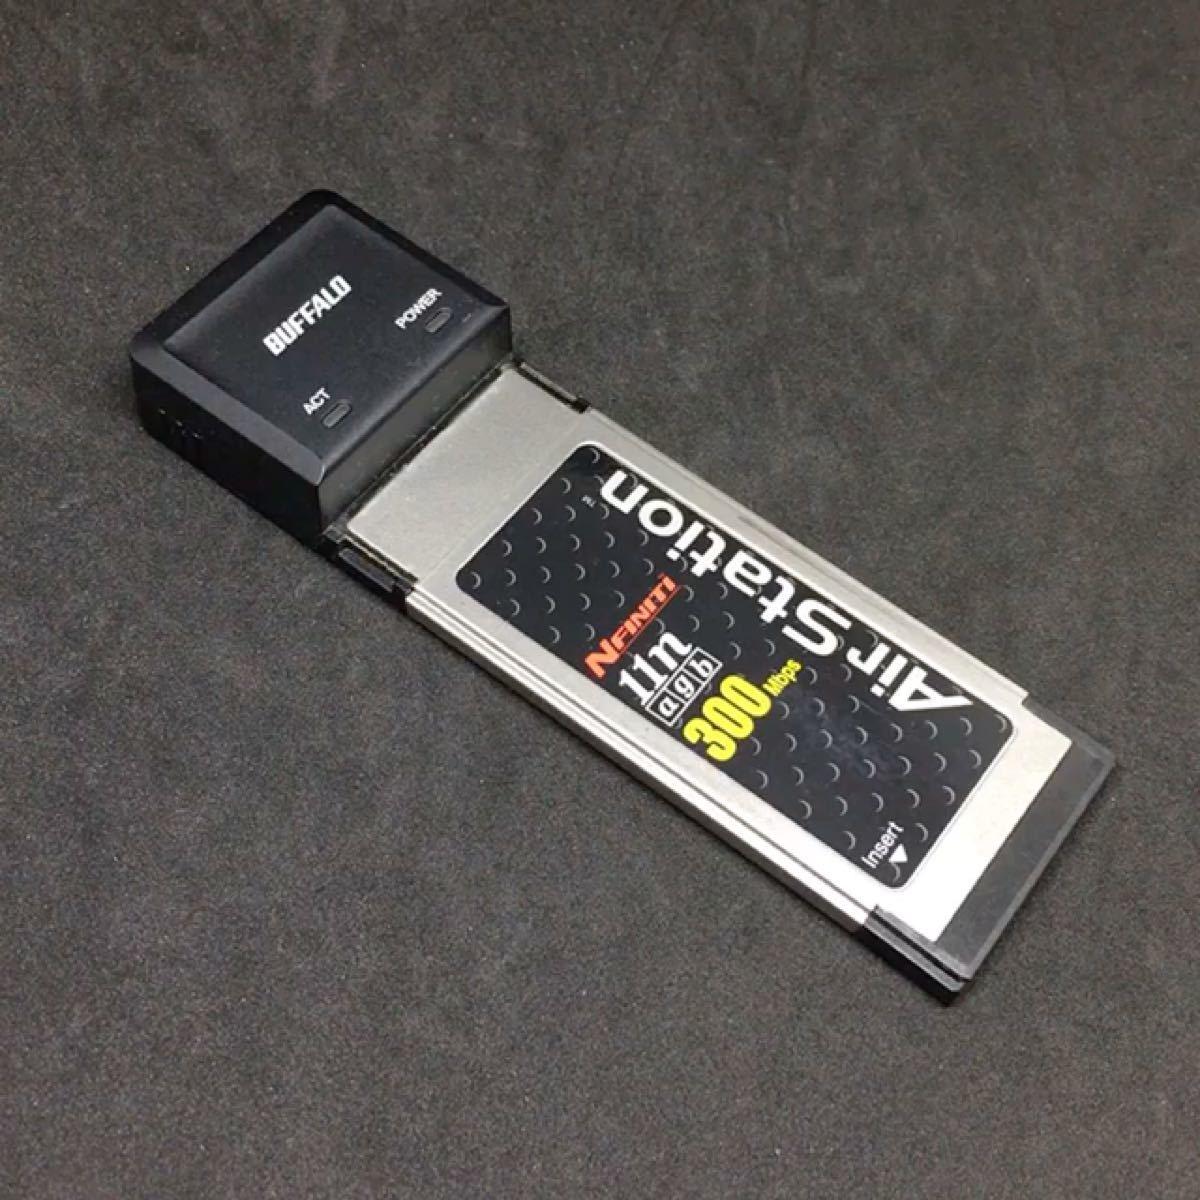 BUFFALO バッファロー ExpressCard 無線LAN子機 WLI-EXC-AG300N (動作未確認)AOSS WPS